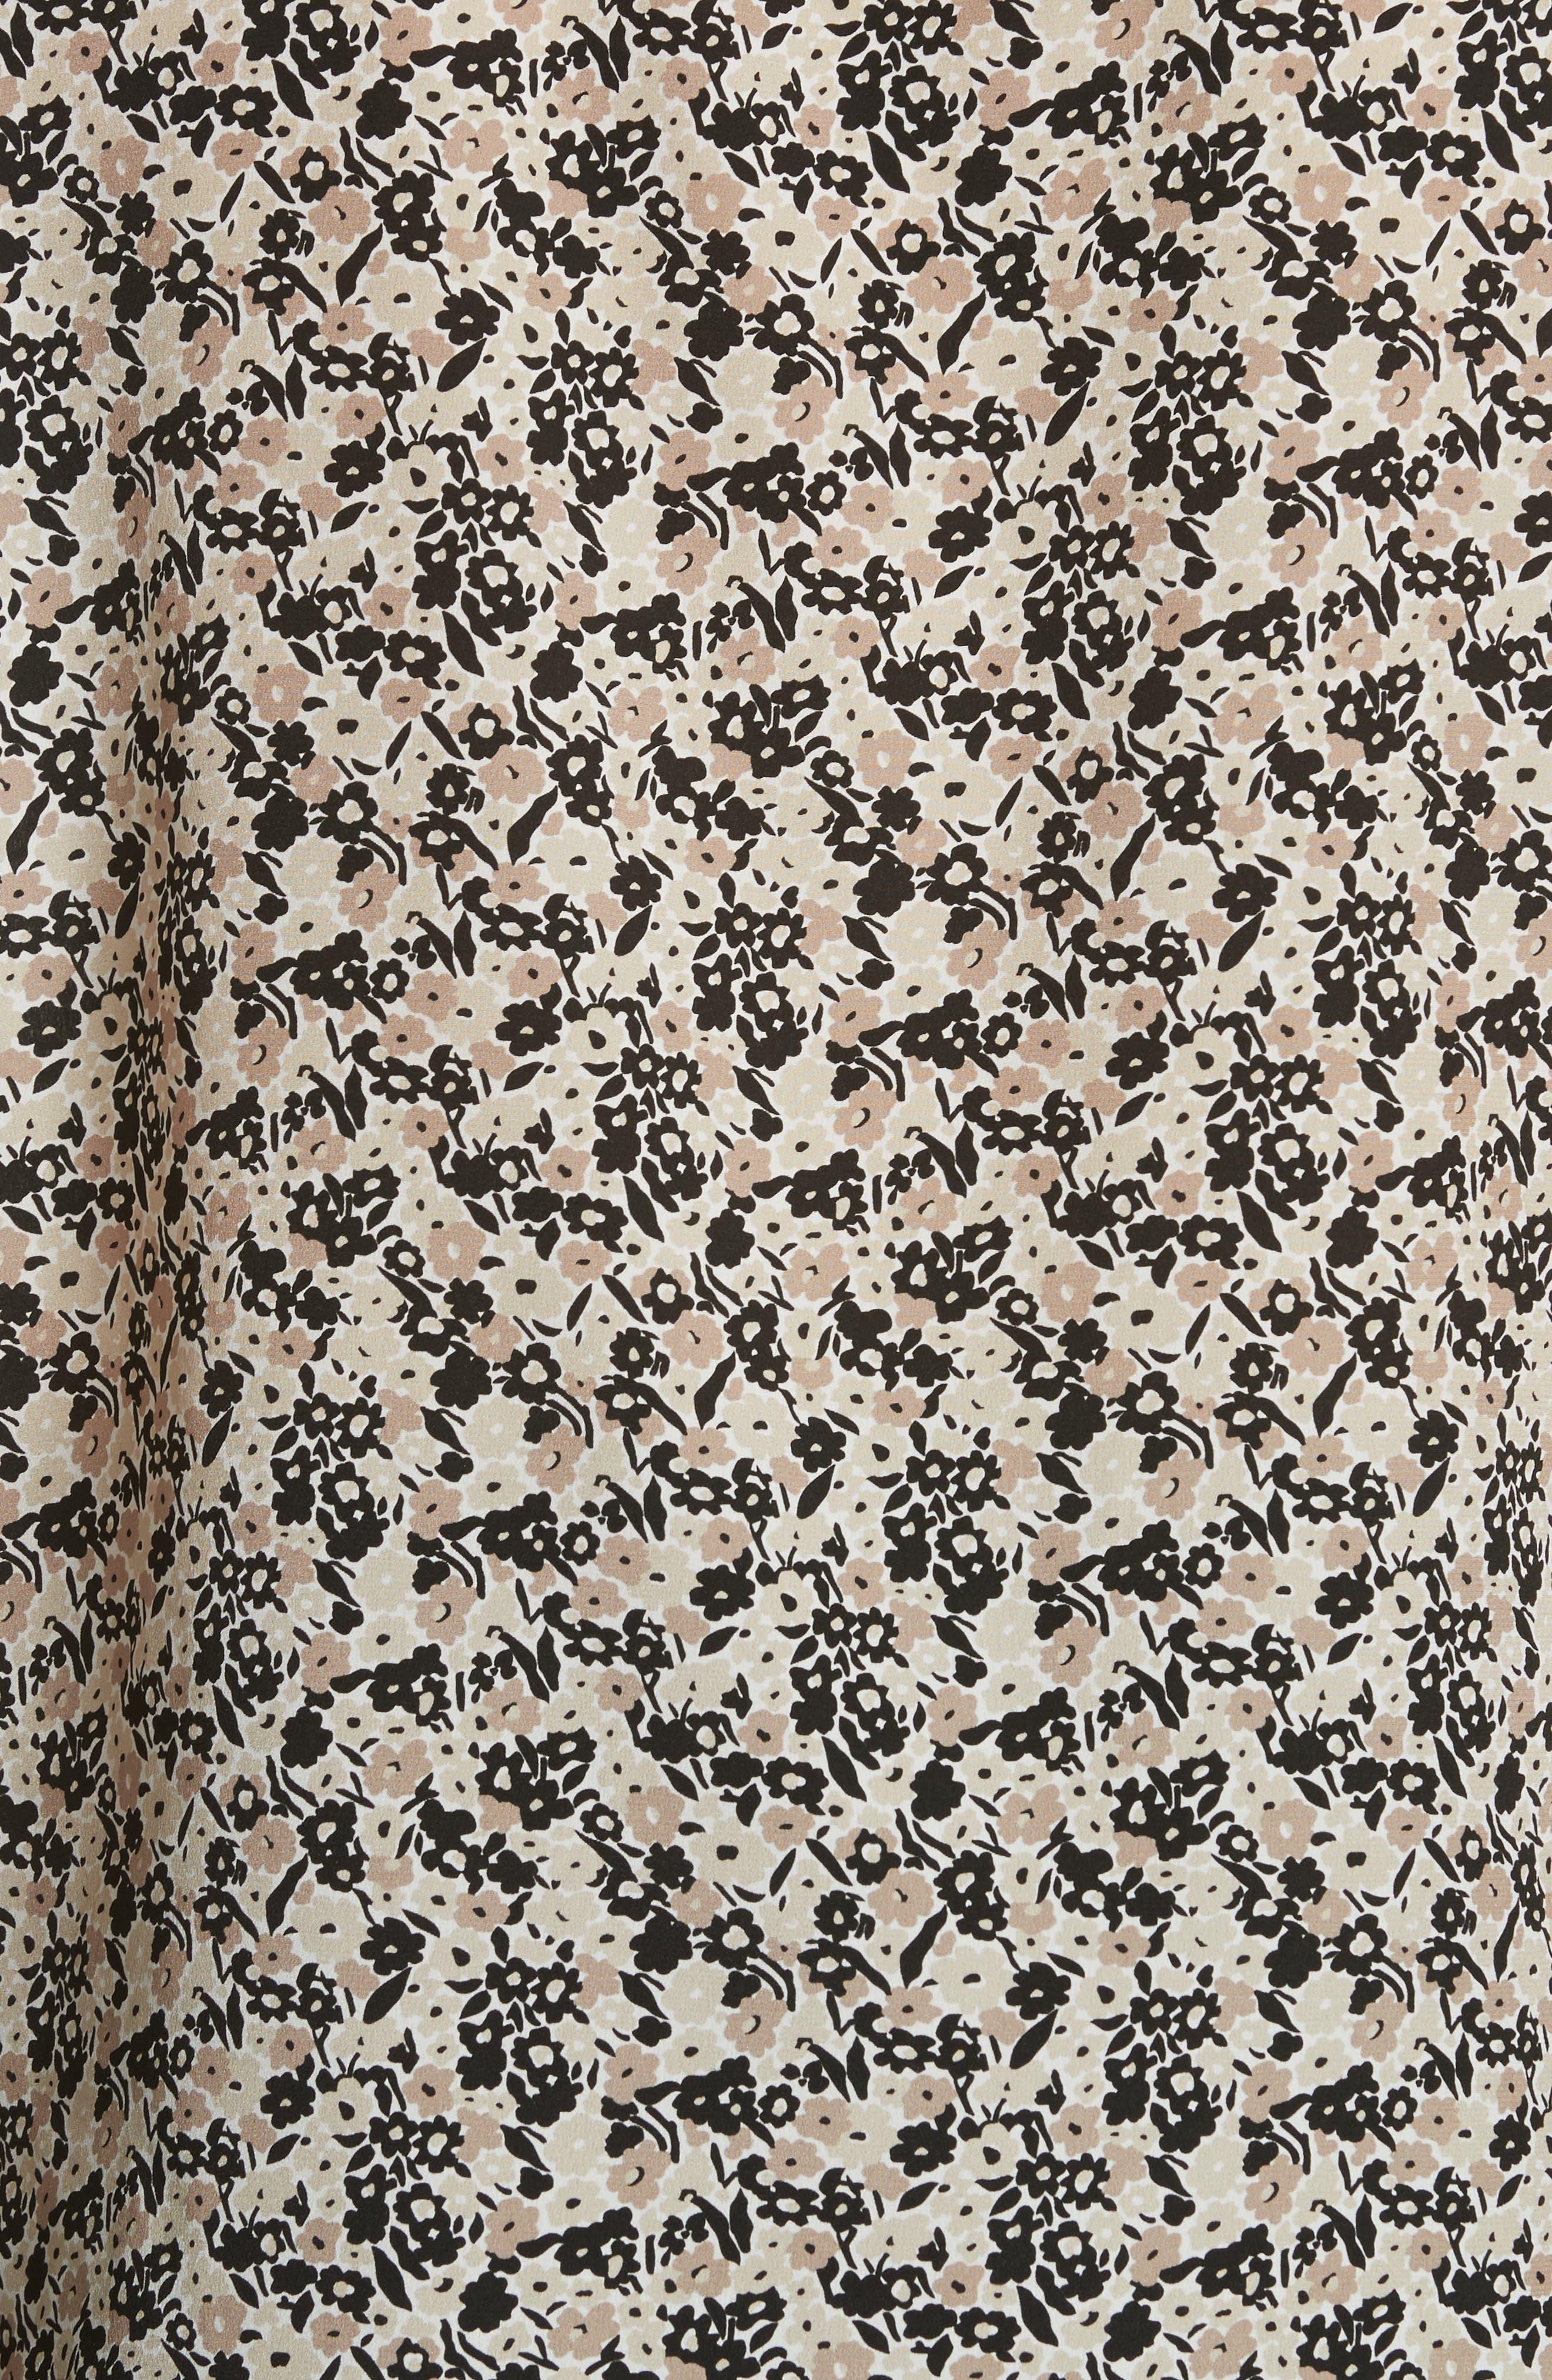 Louvre Print Silk Top,                             Alternate thumbnail 5, color,                             256